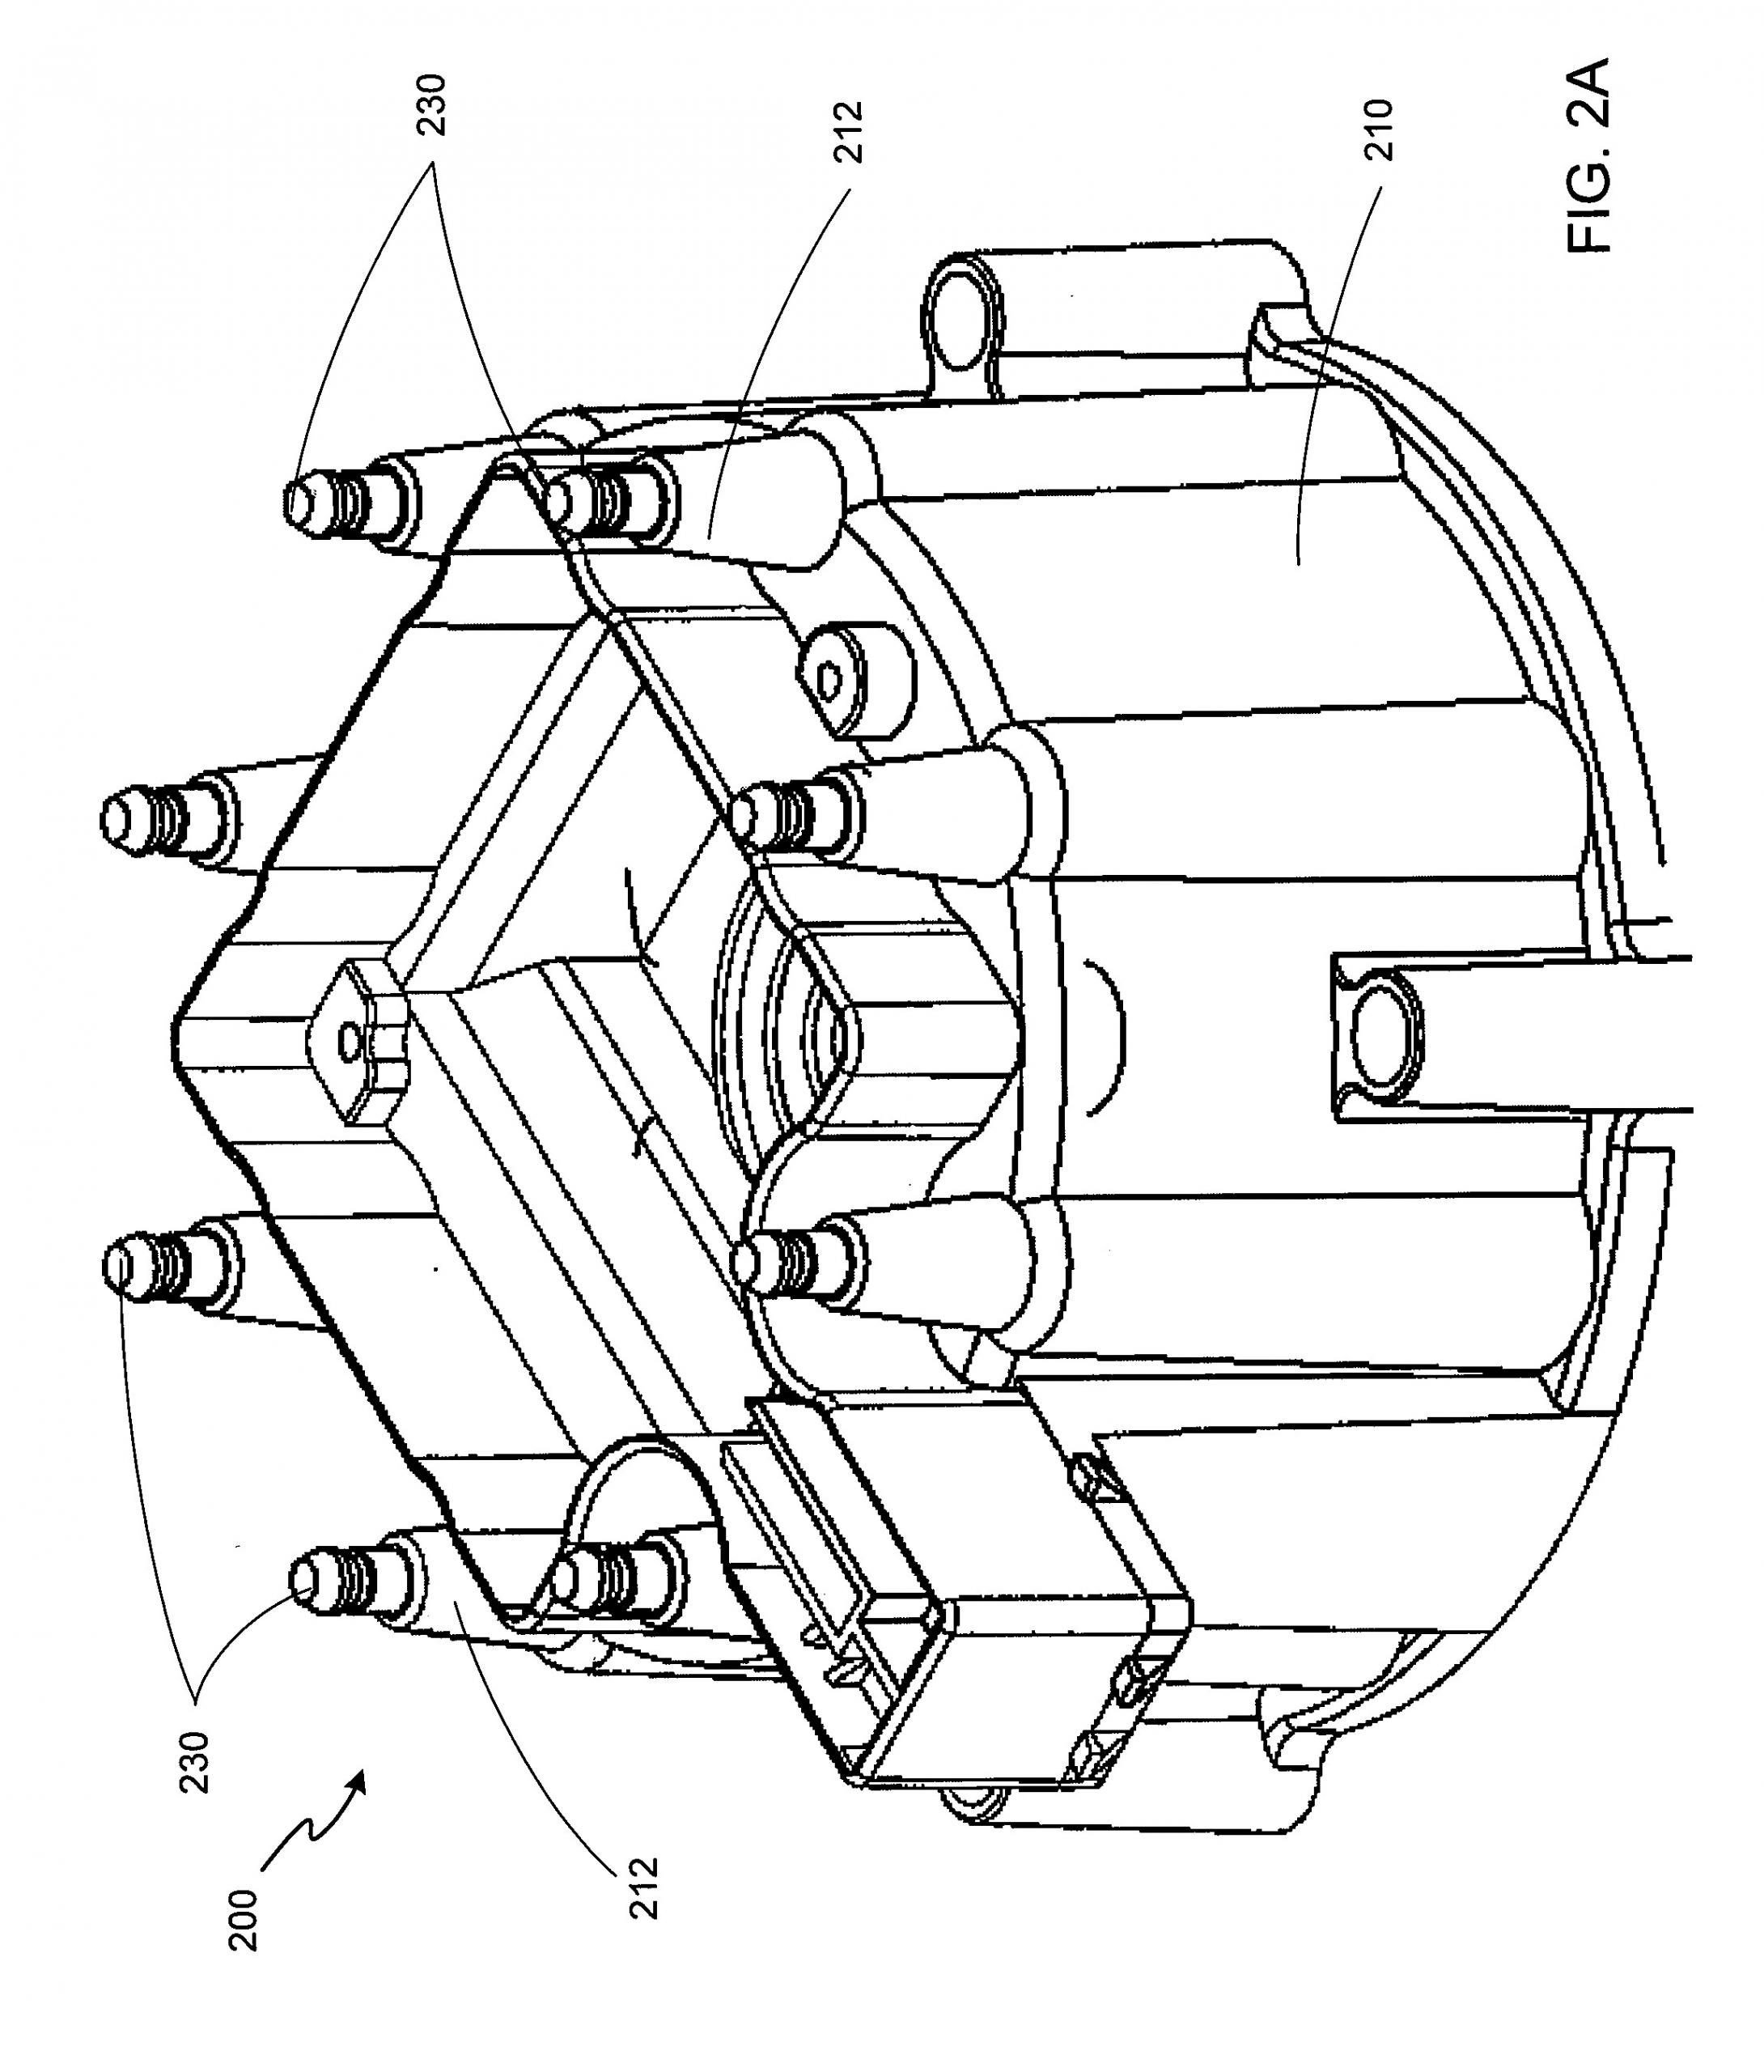 Digram Of the Sensors On A 1986 Gm 305 Motor 2001 ford Focus Firing order